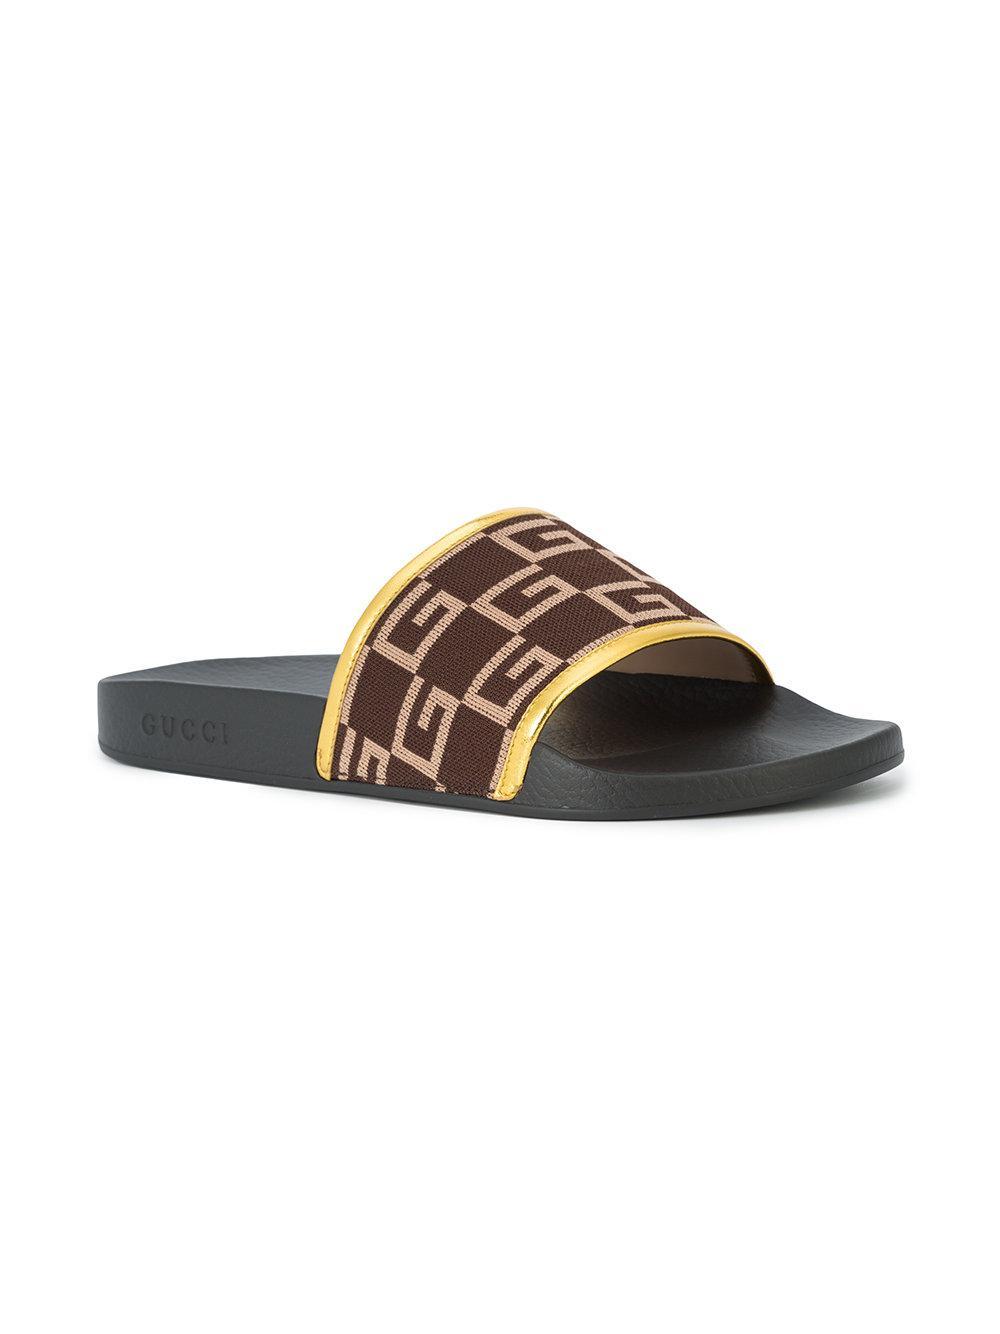 1c5ef6b0e14 Lyst - Gucci G Print Shower Slides in Black for Men